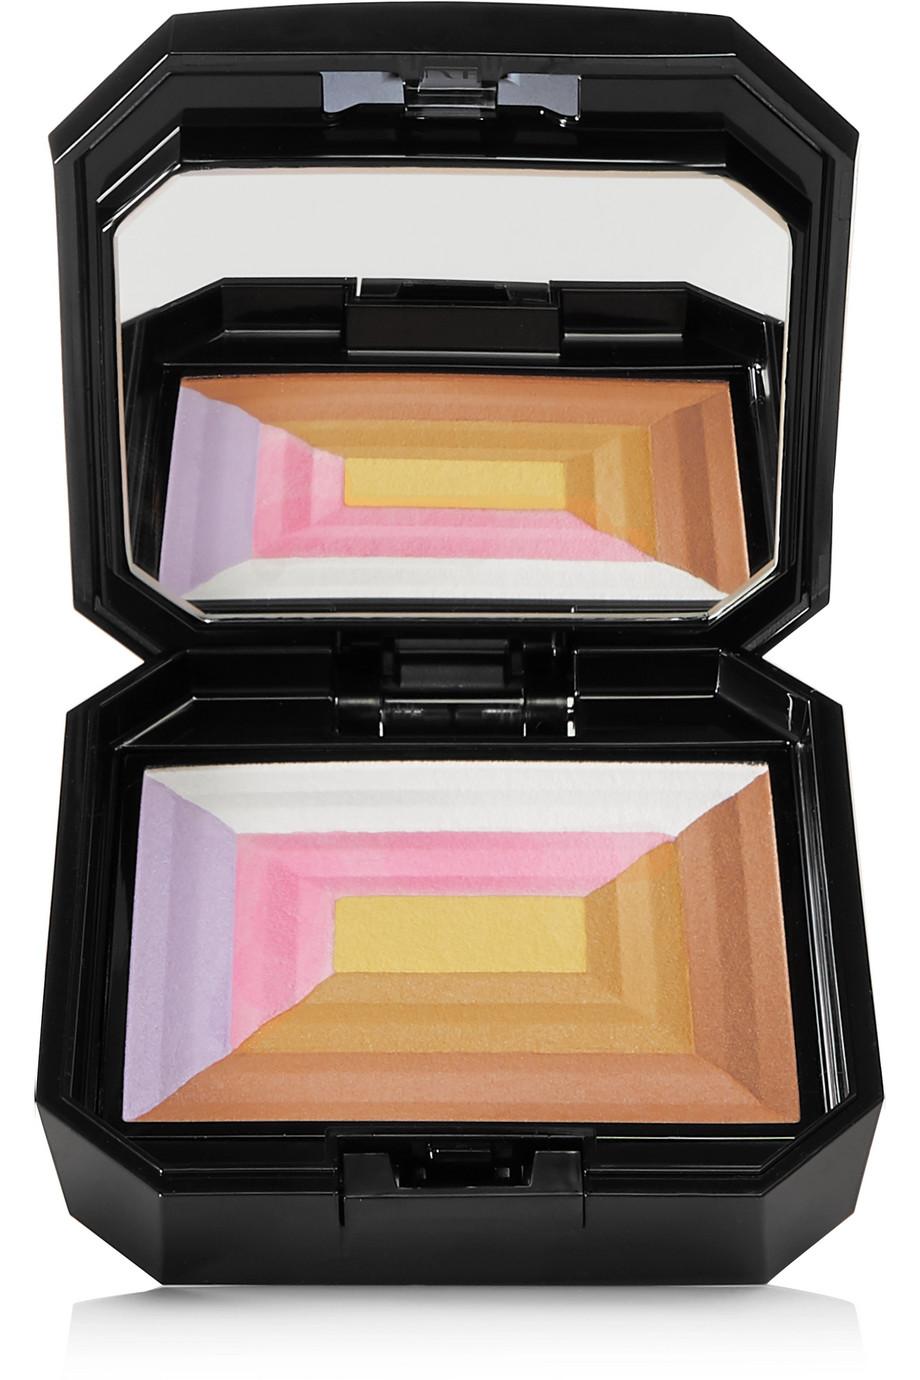 Shiseido 7 Light Powder Illuminator – Make-up-Palette